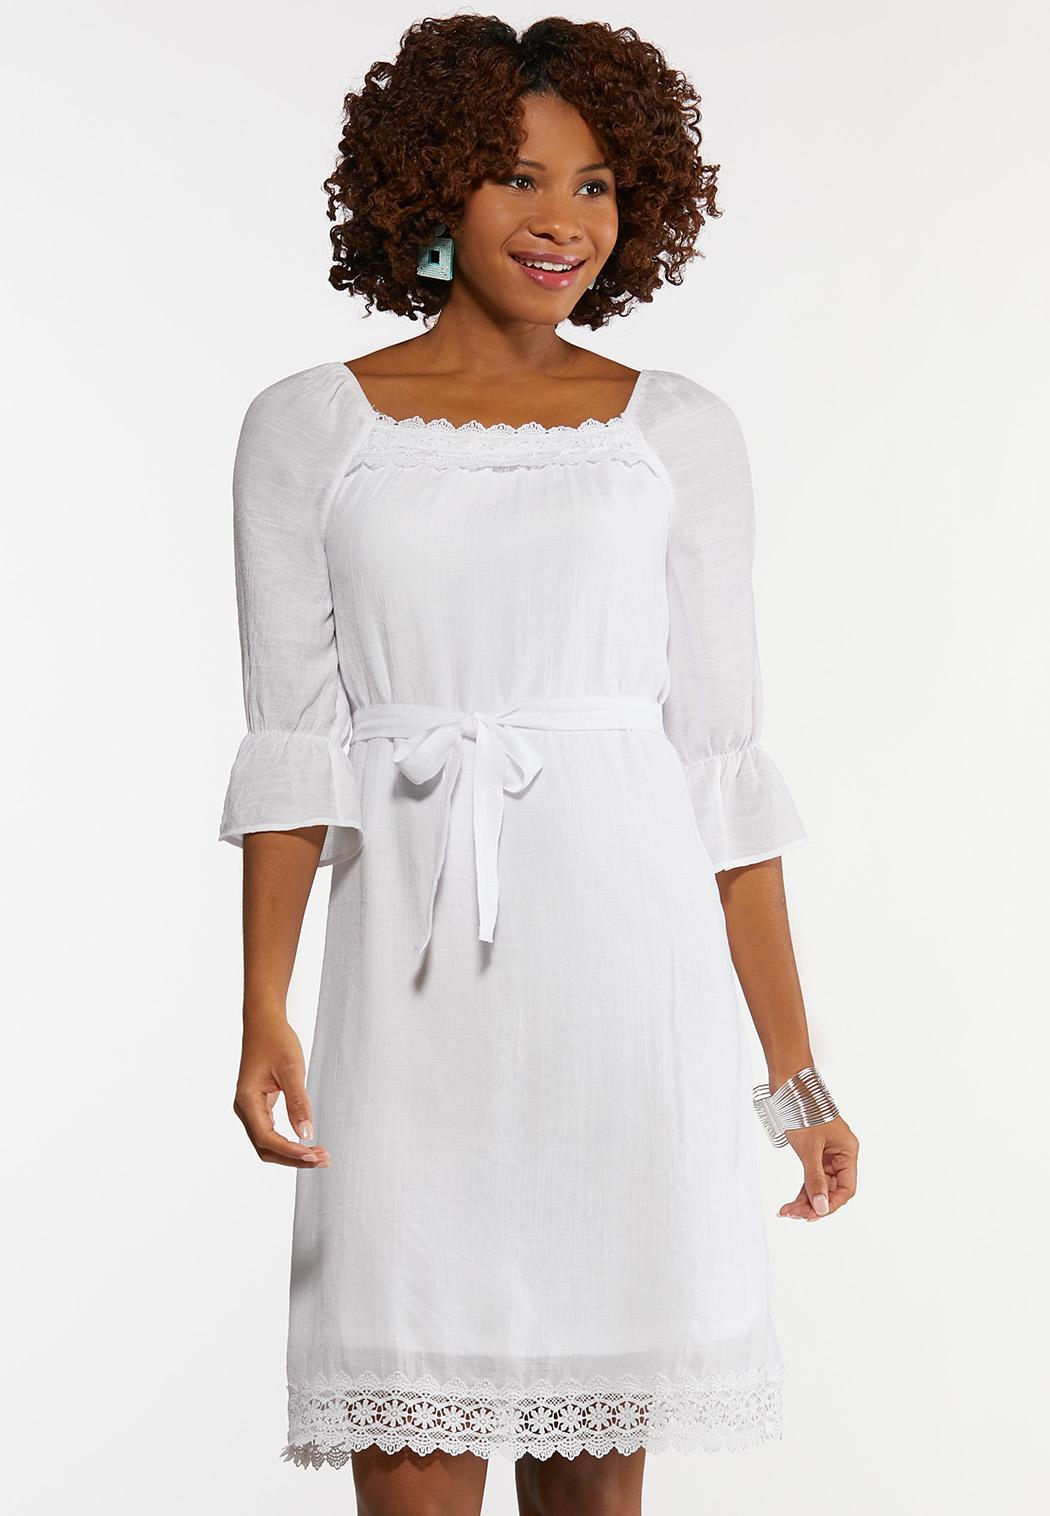 White Square Neck Peasant Dress